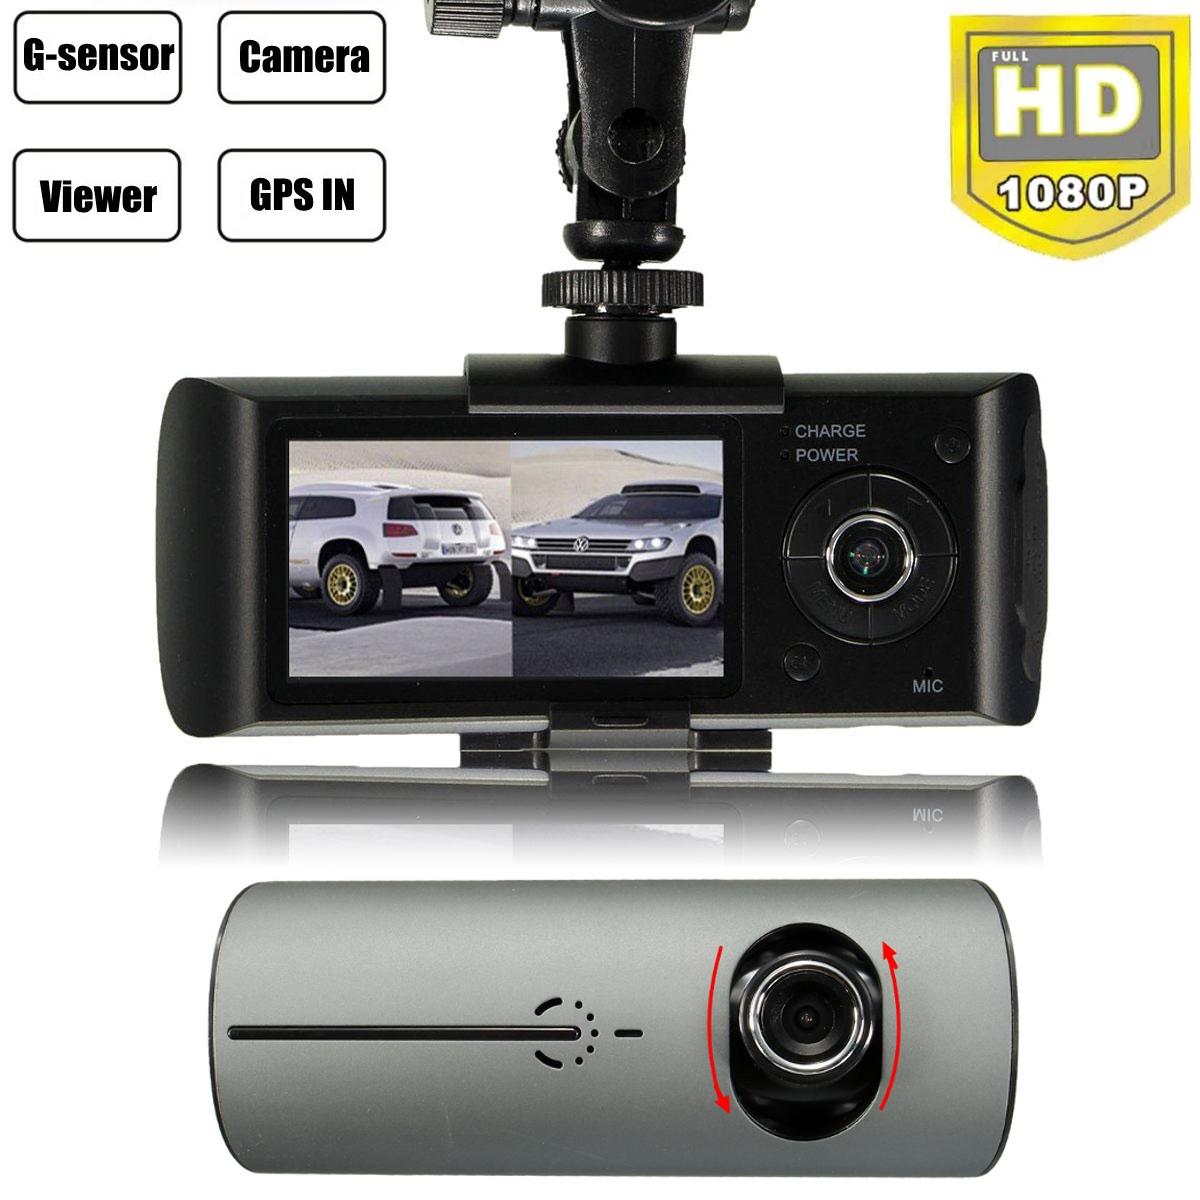 Dual Lens CDVRK400 Car Dash Camera With GPS Logger And G